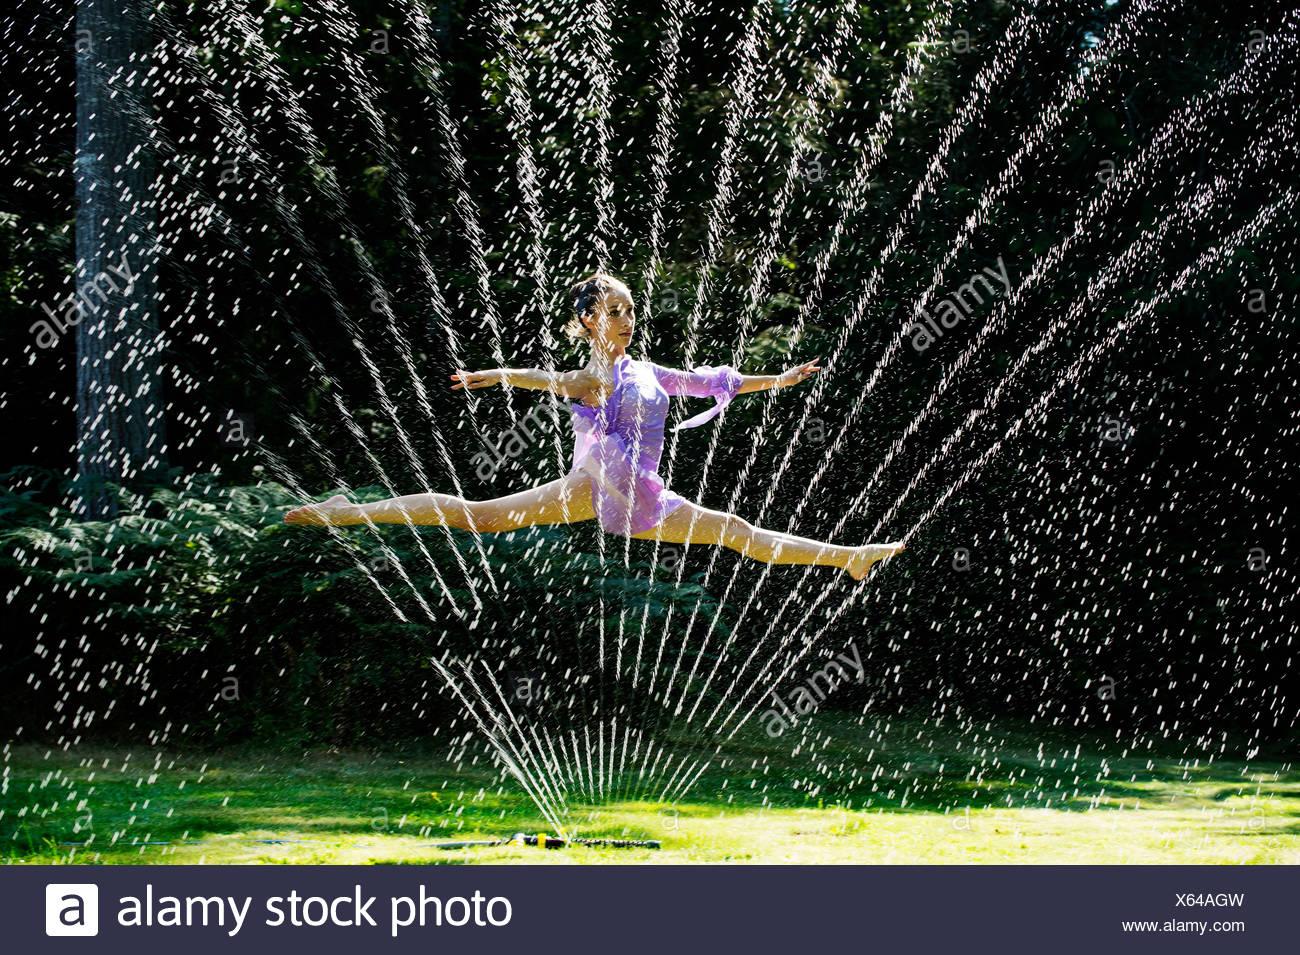 Ballerina leaping through a water sprinkler - Stock Image